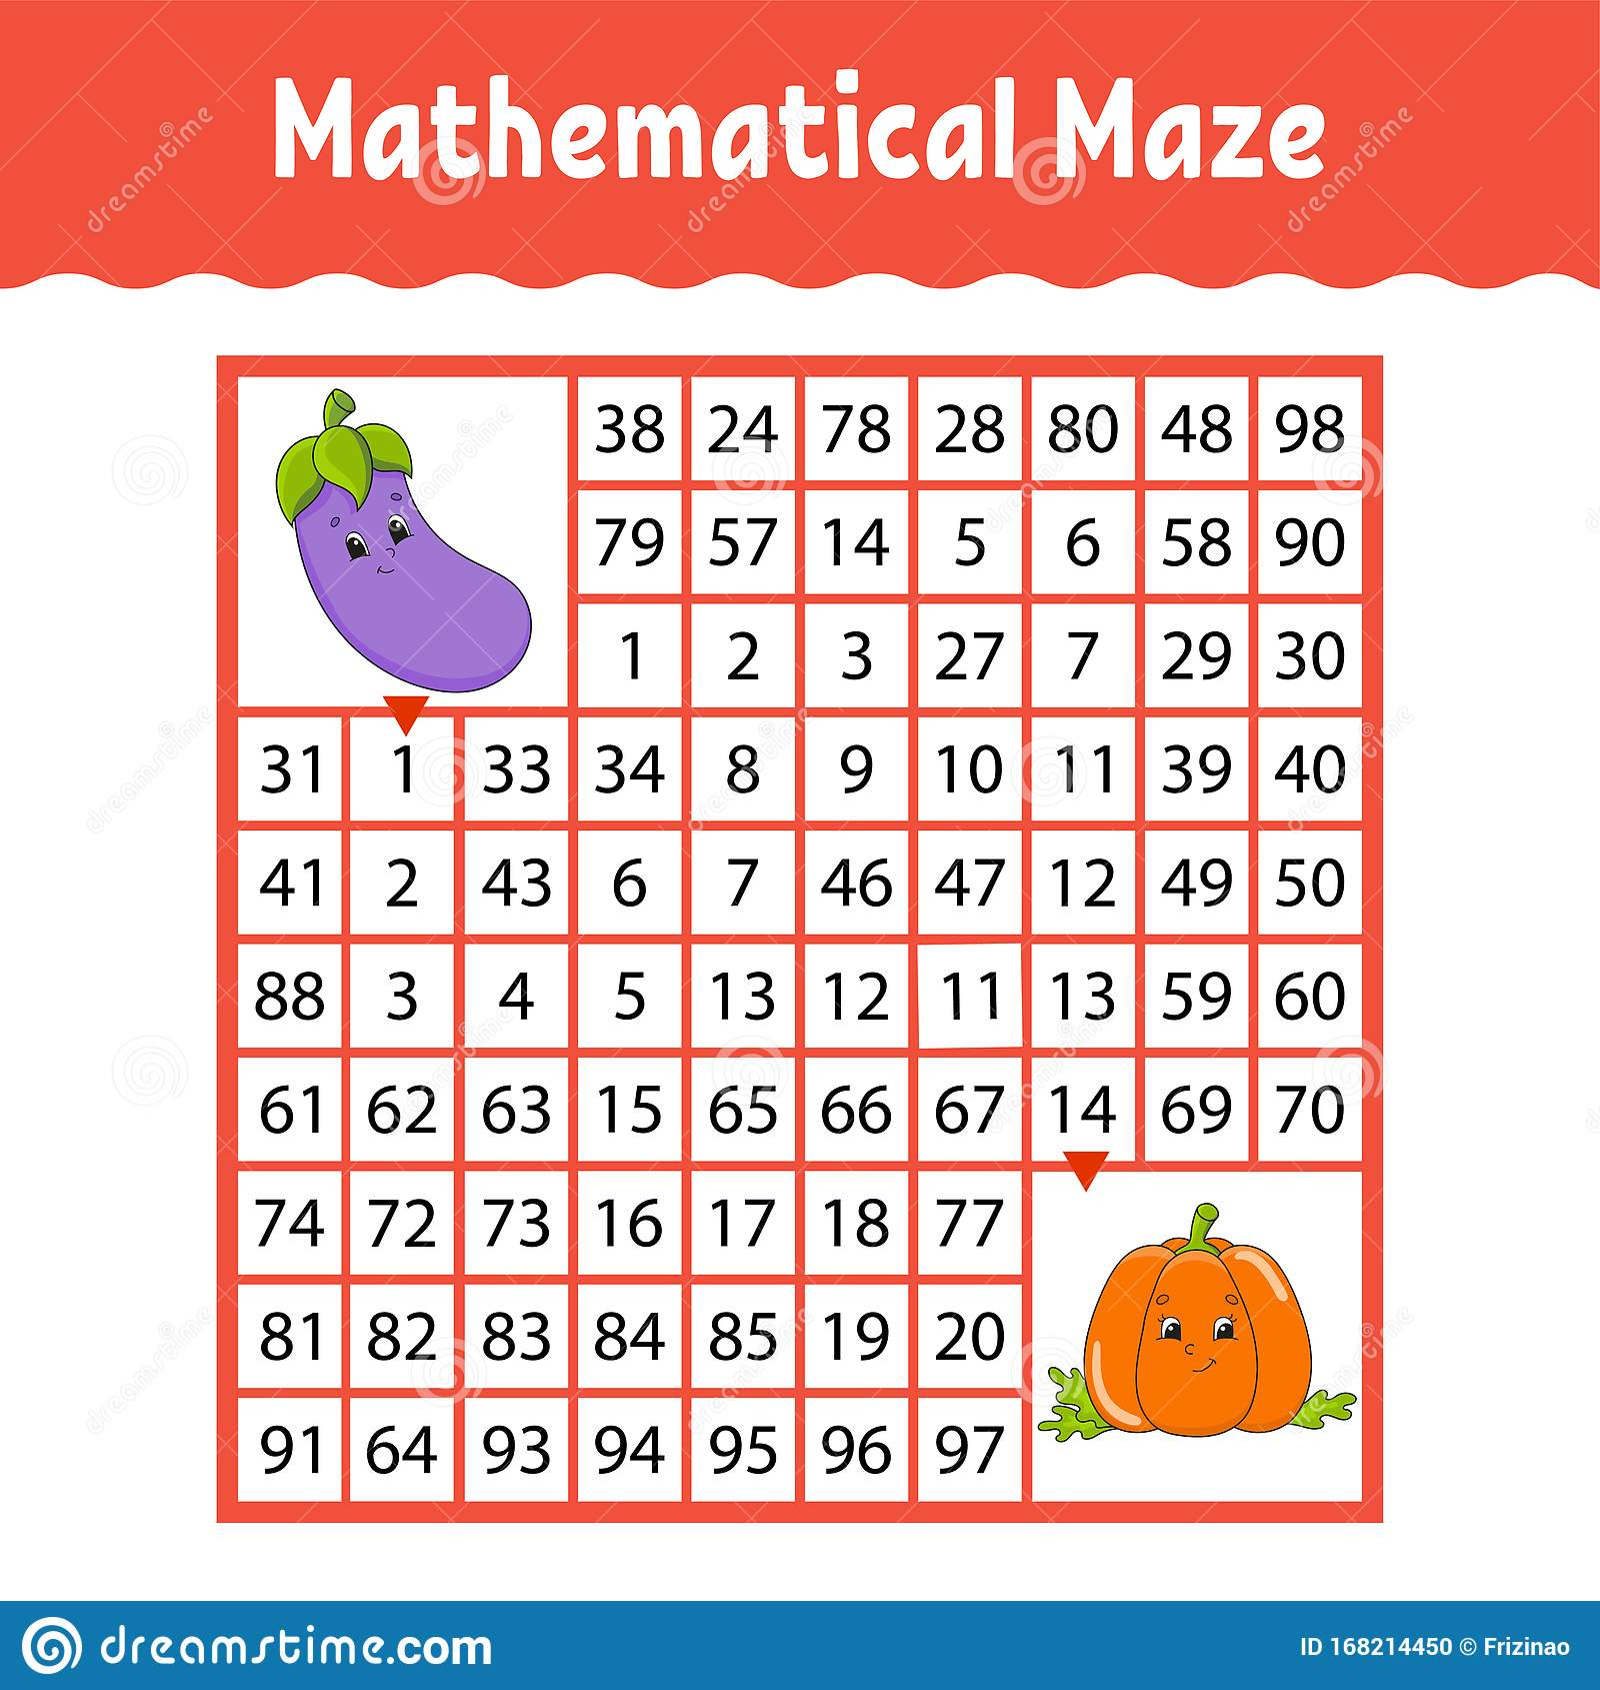 Vegetable Eggplant Pumpkin Mathematical Square Maze